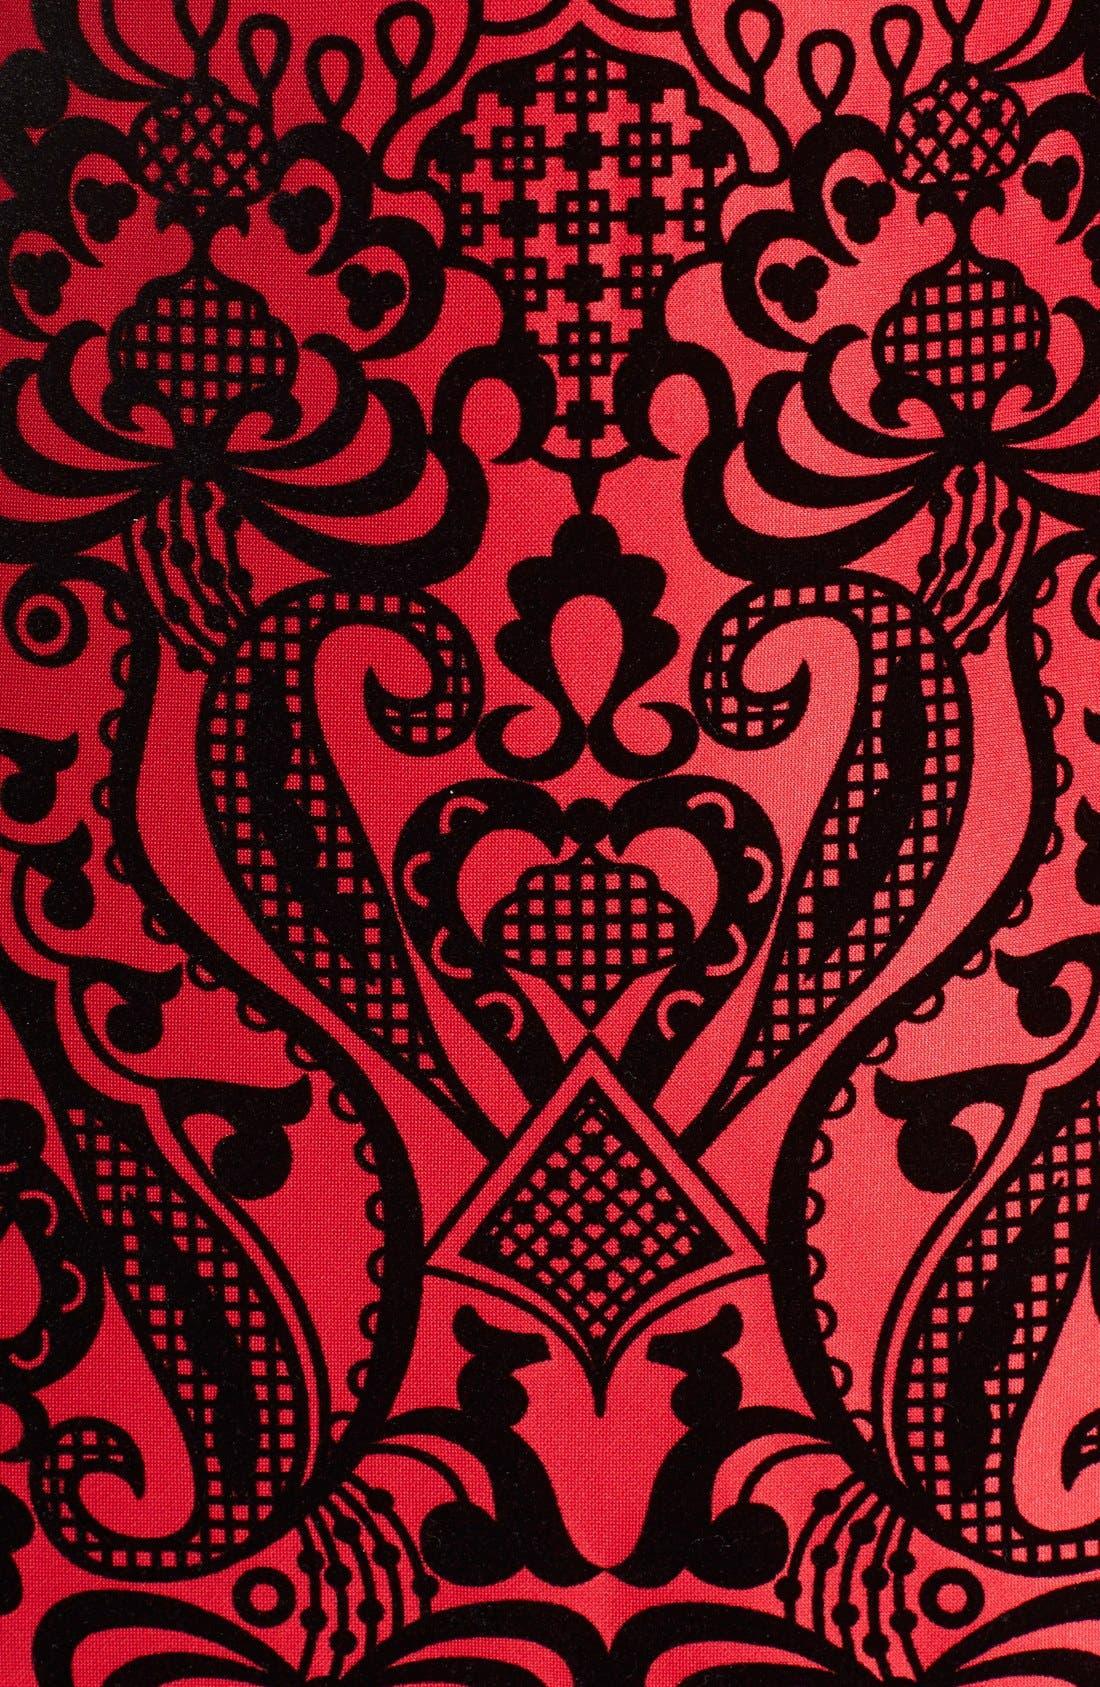 Flecked Scuba Sheath Dress,                             Alternate thumbnail 5, color,                             Black/ Red